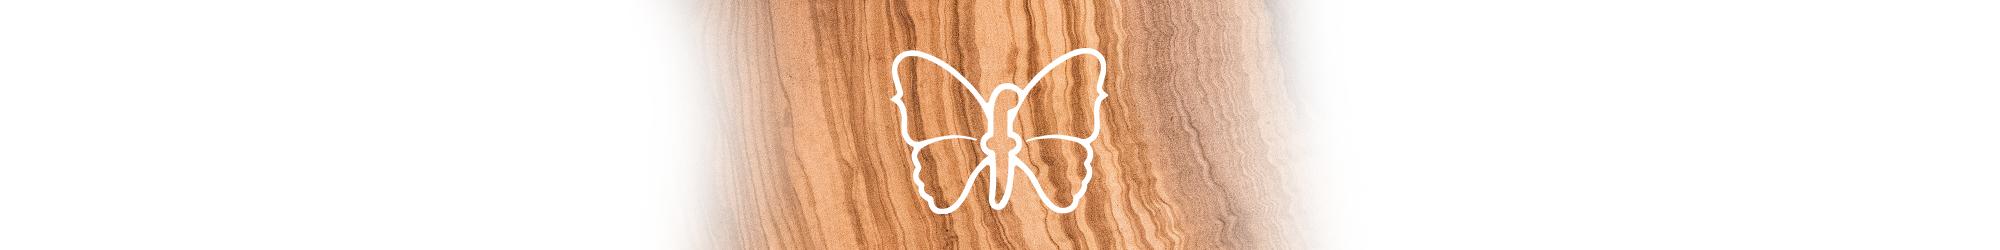 Fodera Logo Banner